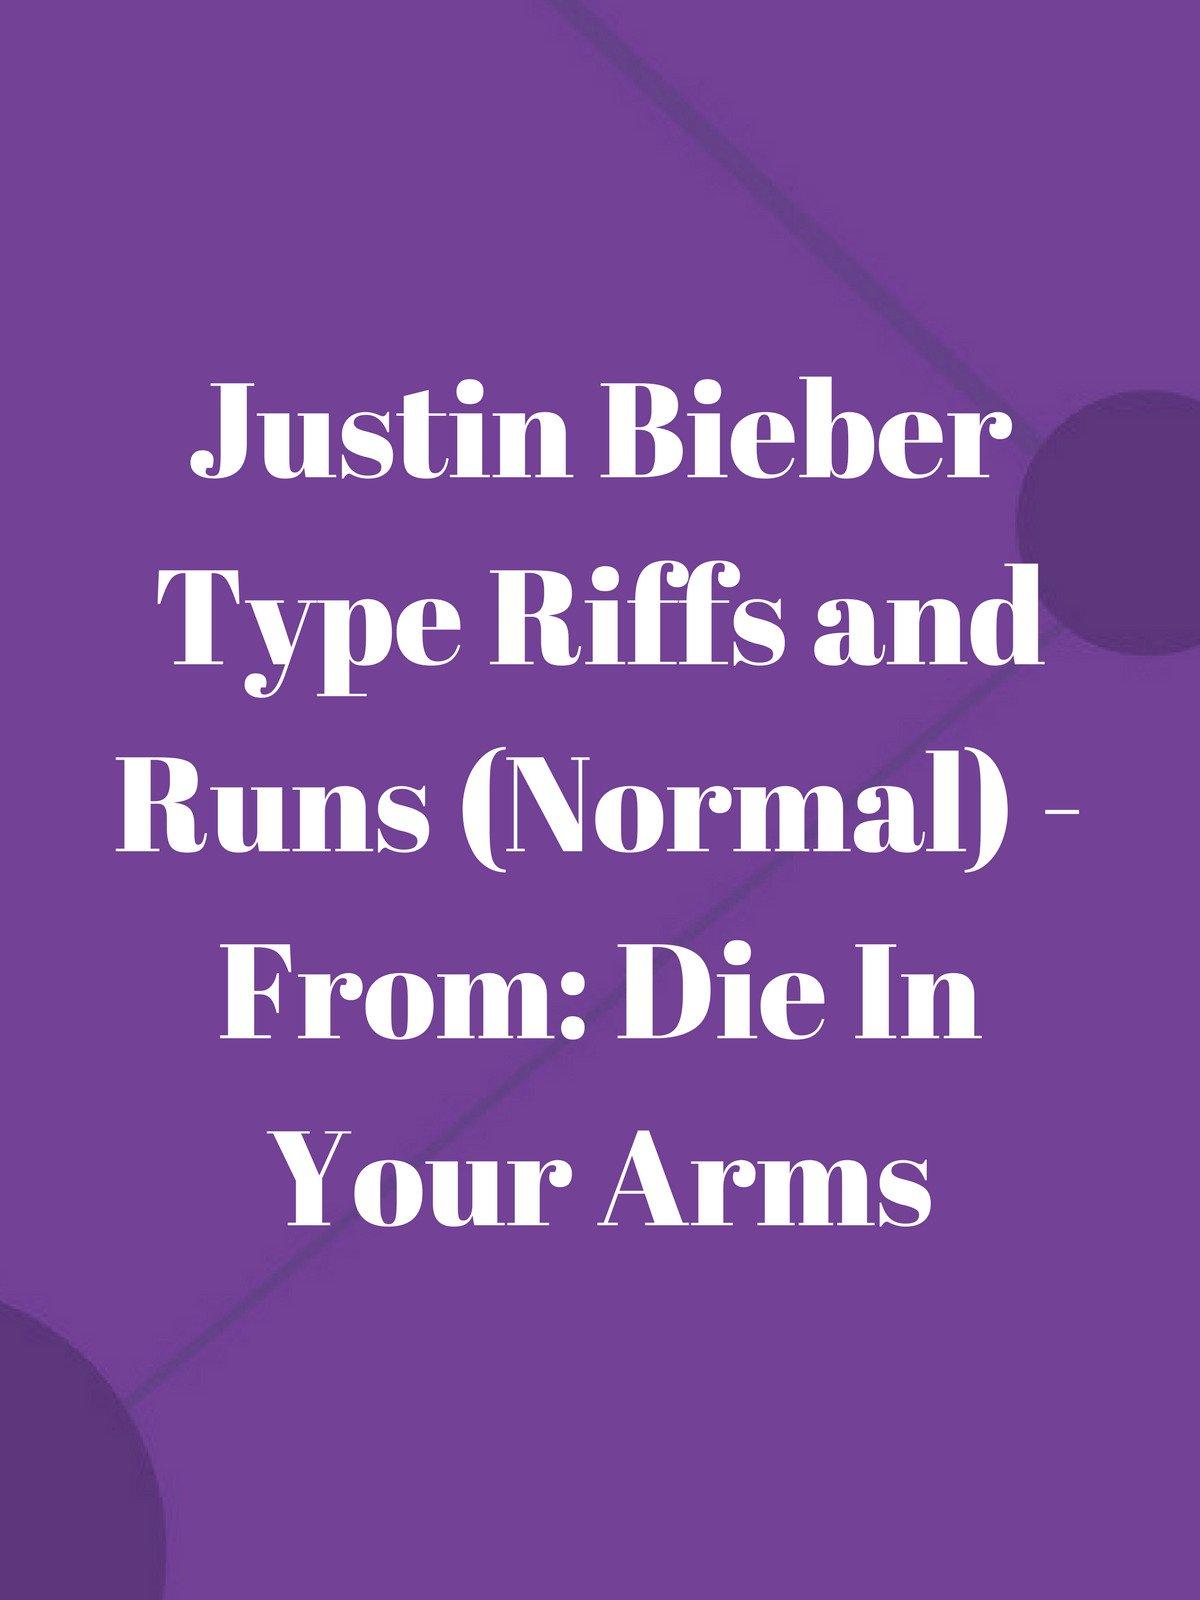 Justin Bieber Type Riffs and Runs (Normal)